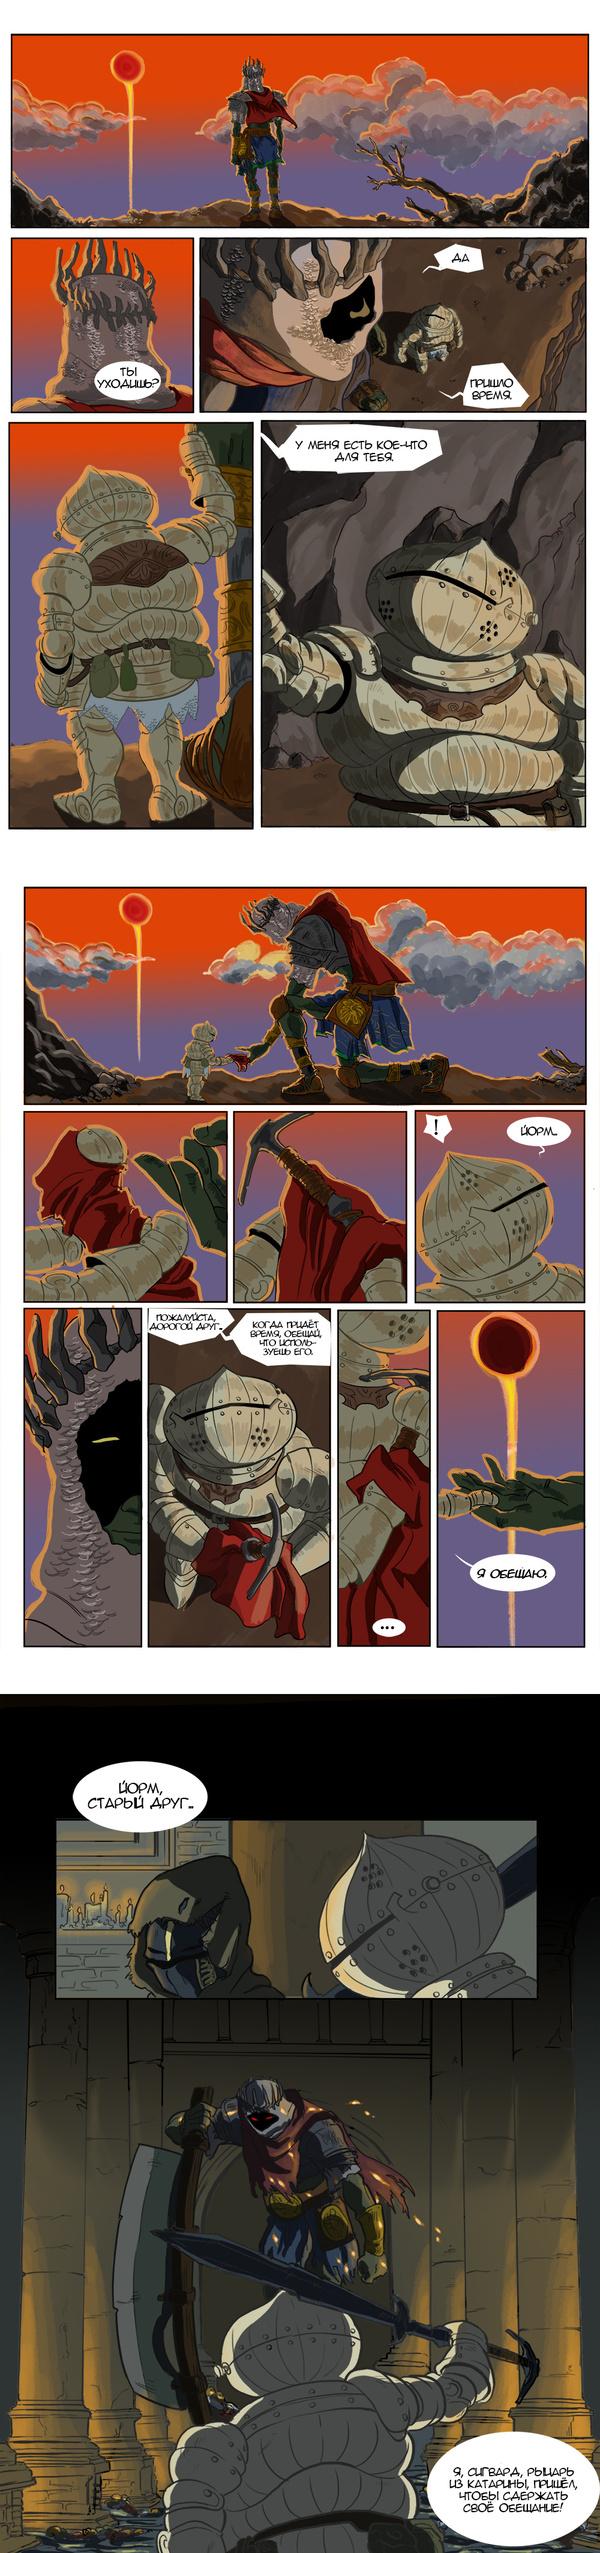 Маленький фанатский комикс про Йорма и Сигварда Dark Souls 3, Сигвард из Катарины, Гигант Йорм, Giant Yhorm, Siegward of Catarina, Длиннопост